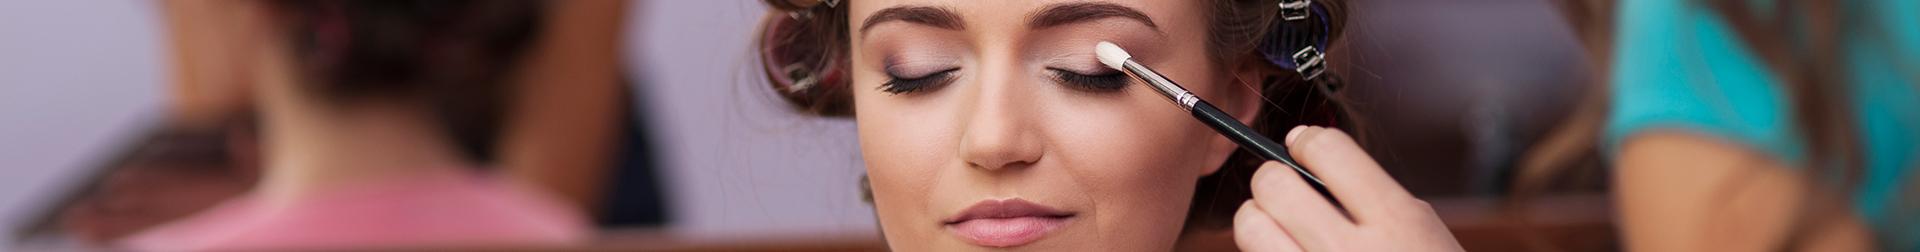 Makeup Palettes Products | Buy Eye Makeup Palettes Online | AromaCraze